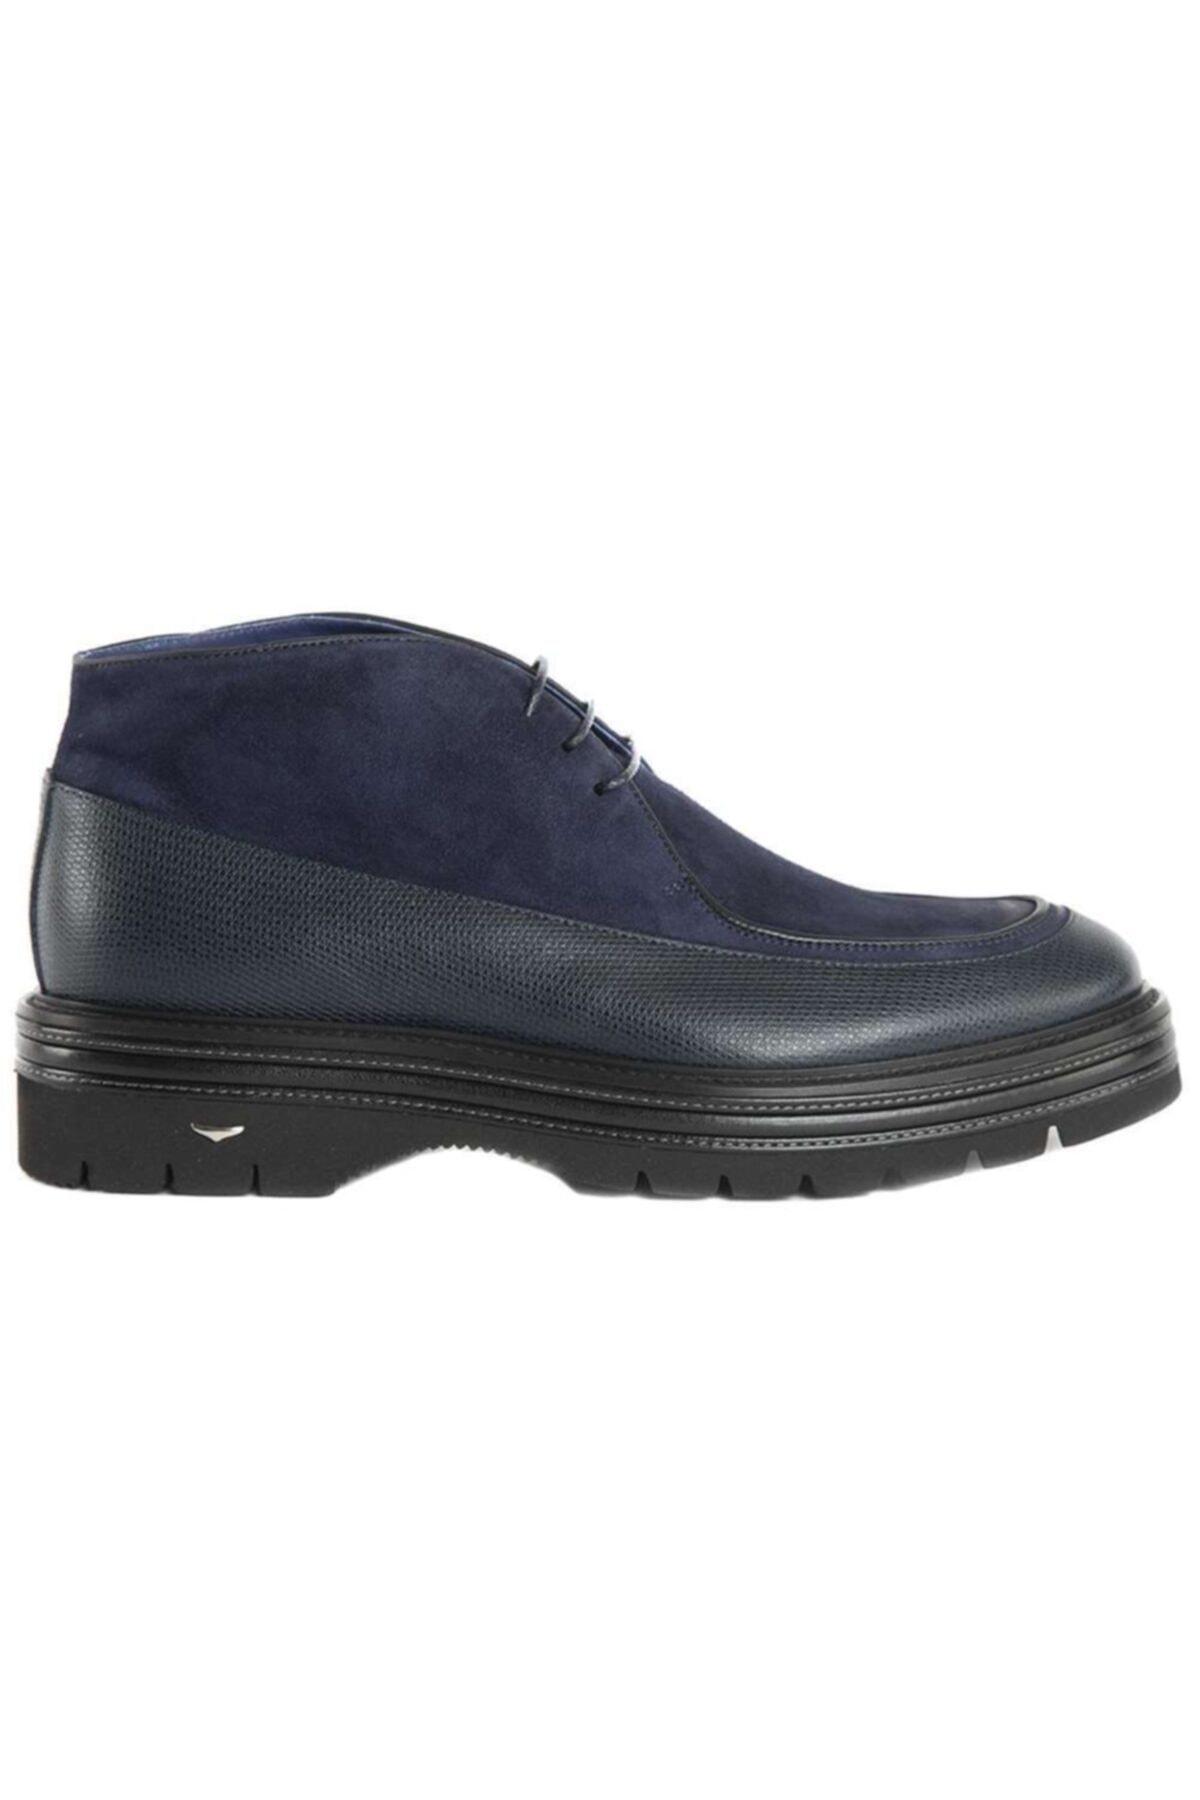 ALBERTO GUARDIANI Man Shoes Aldon 1